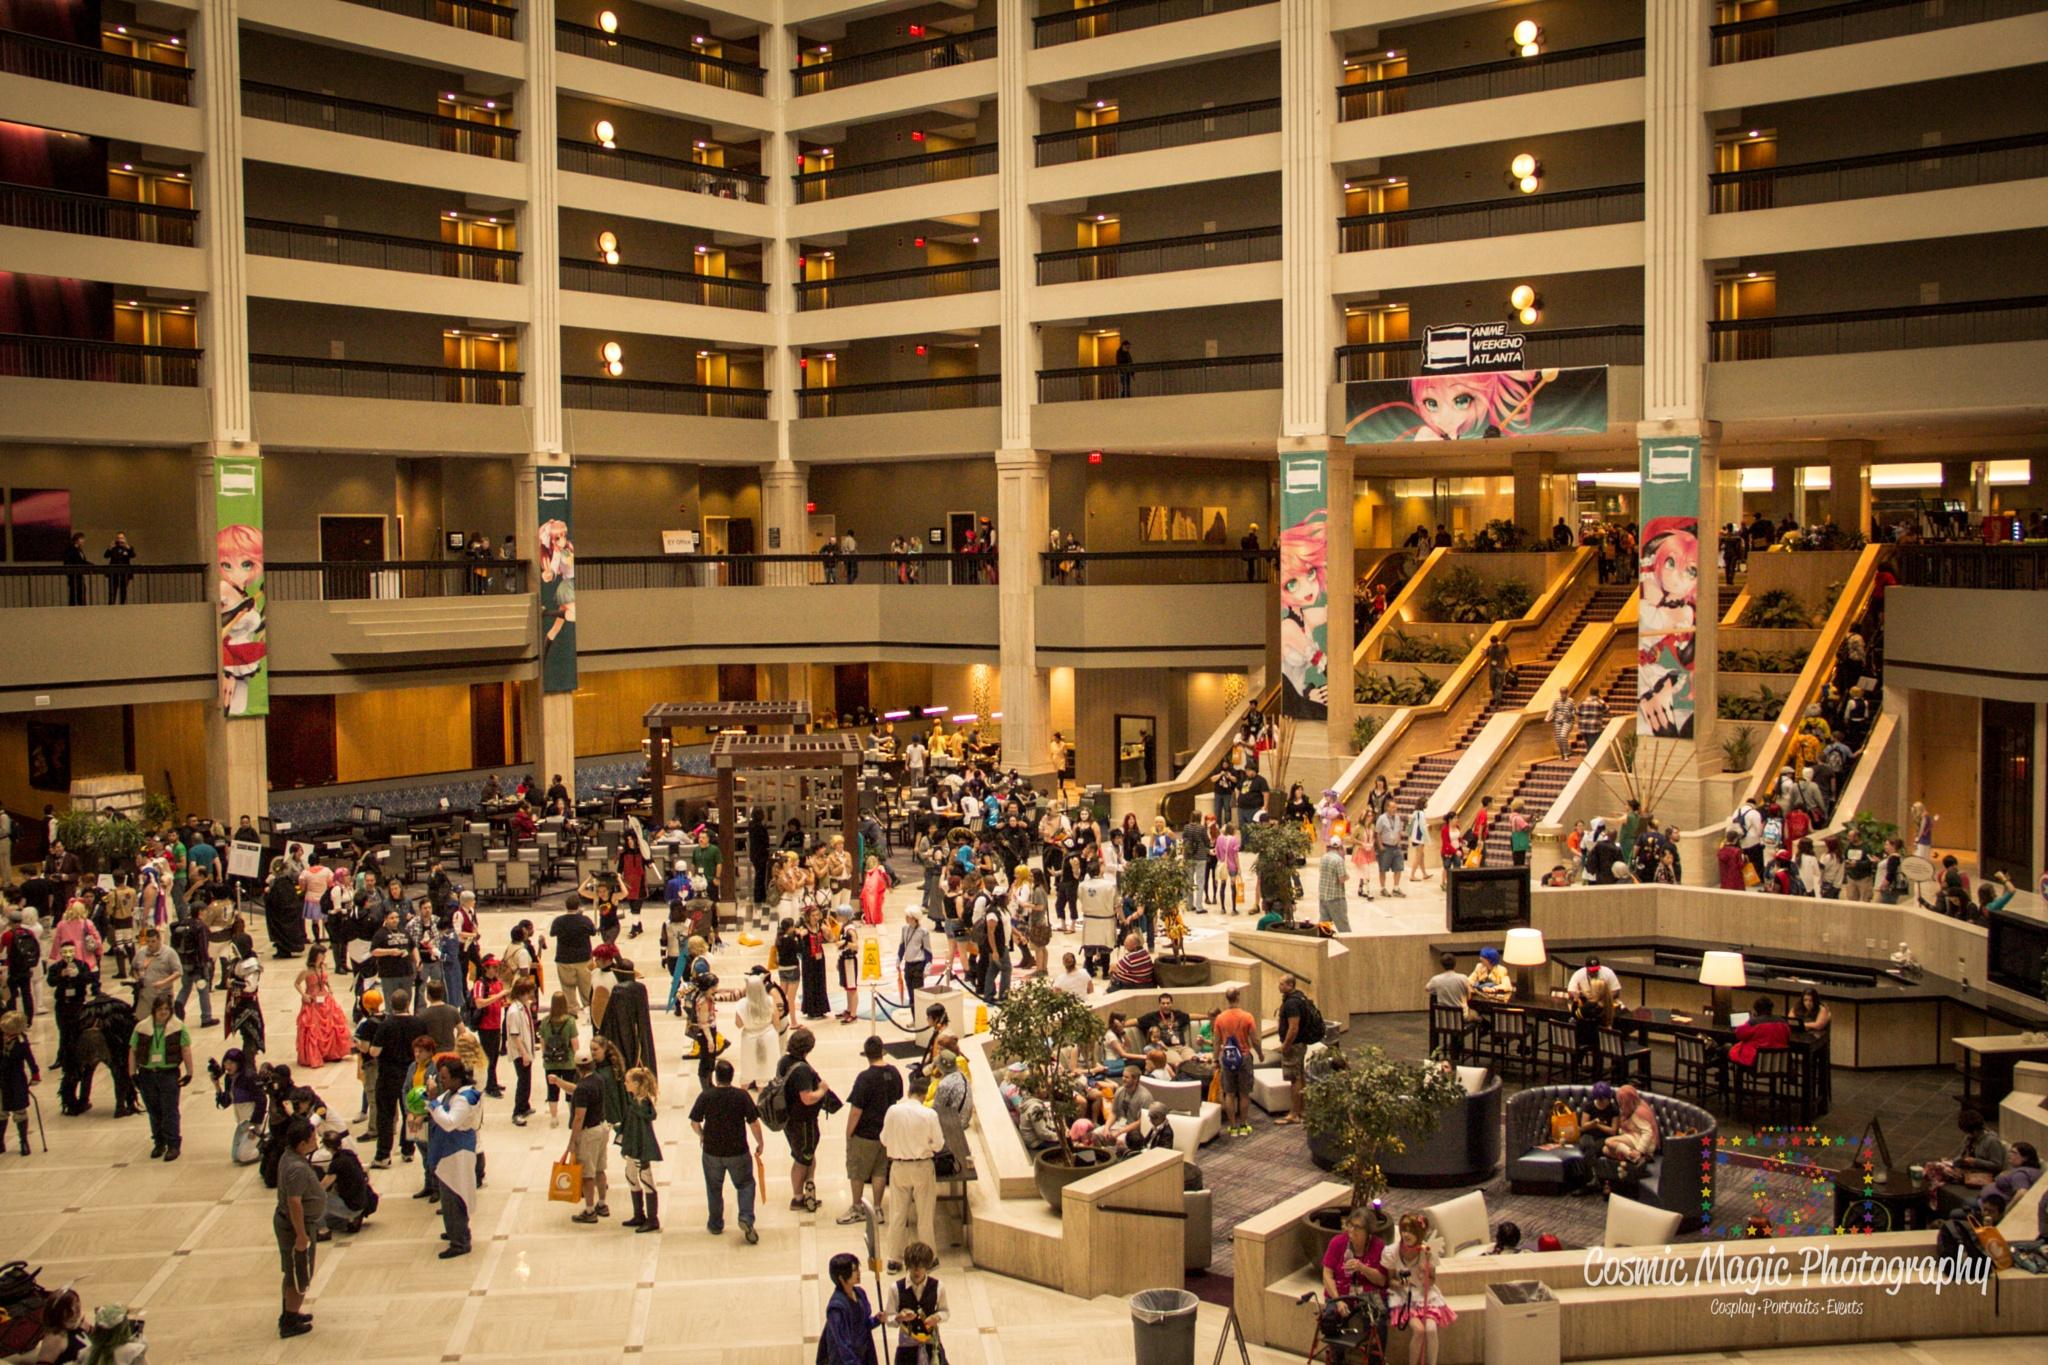 Anime Weekend Atlanta 2015 - Convention Shots by Gina Adkins